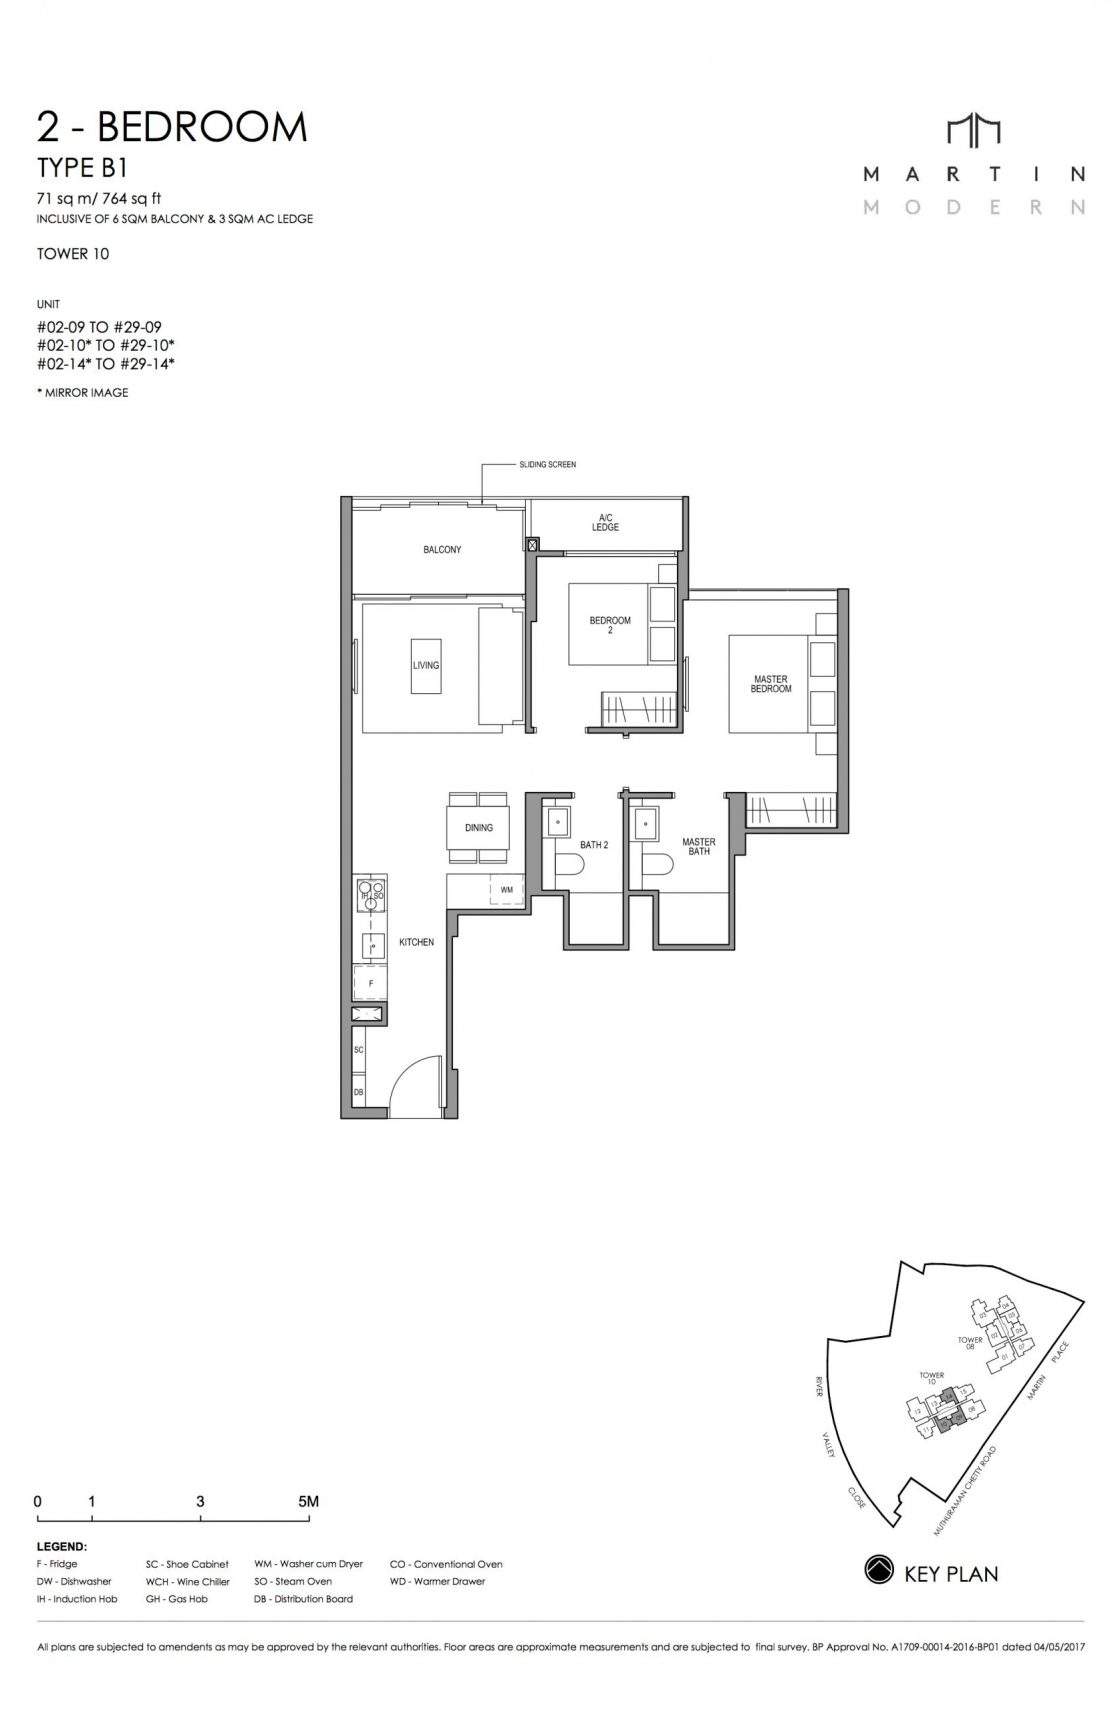 MARTIN MODERN 2-Bedroom TYPE B1